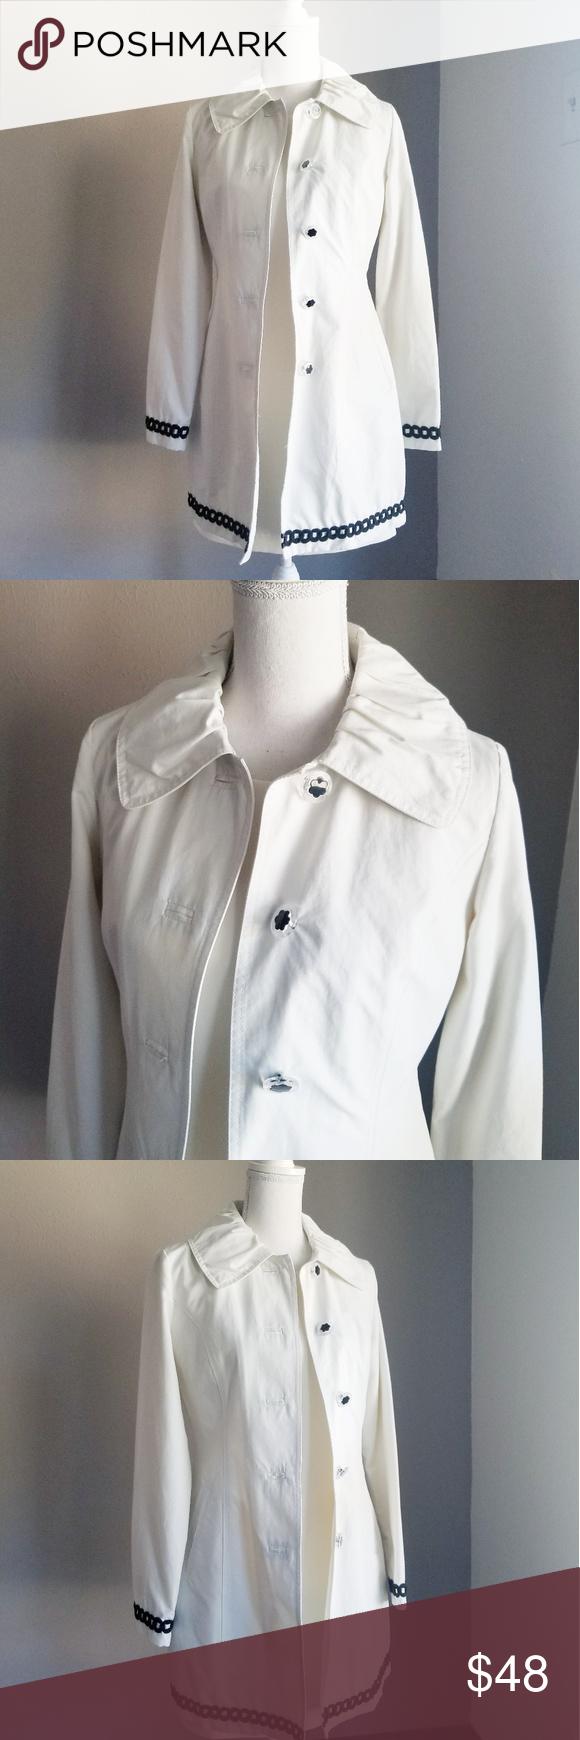 Laundry By Design White Mod Long Raincoat Jacket Raincoat Jacket Clothes Design Long Rain Coat